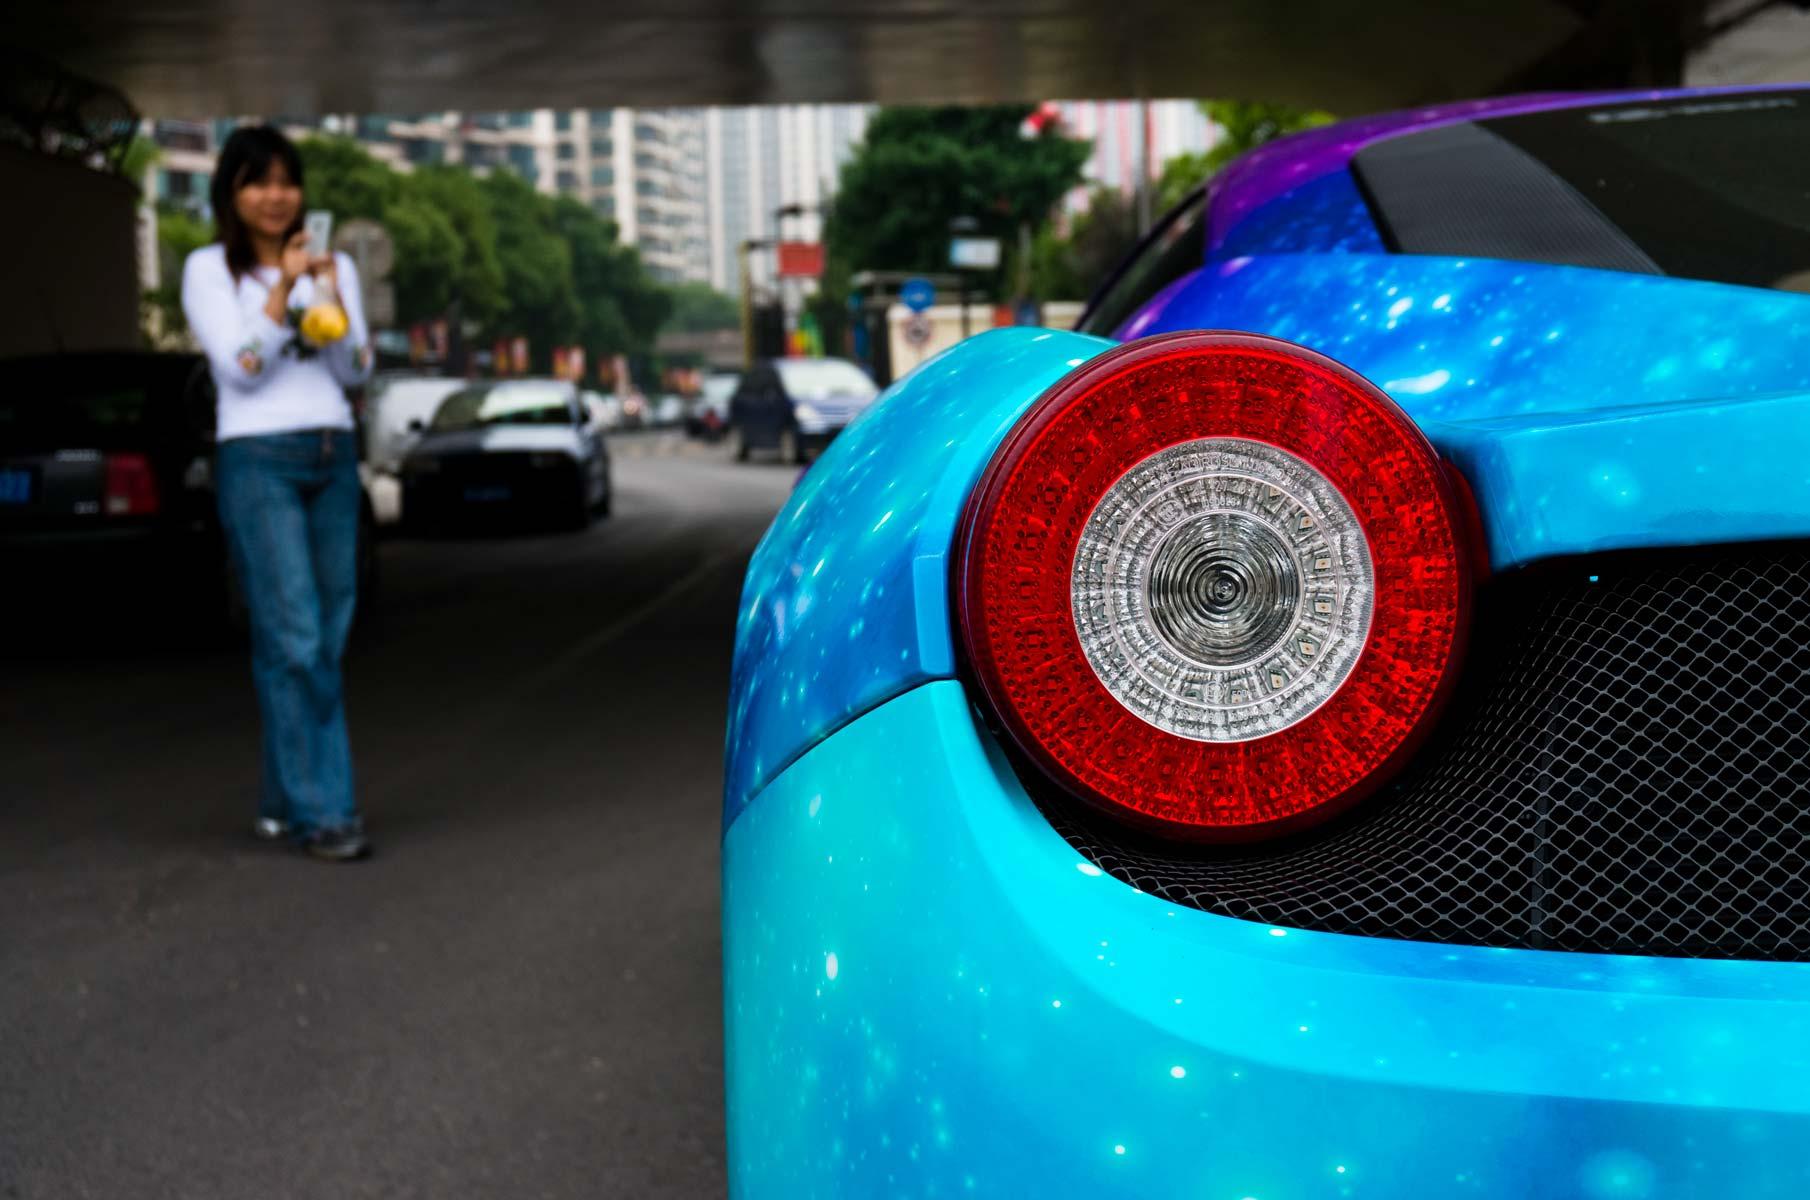 Sternenhimmel Folierung Ferrari 458 Italia in Shanghai, China